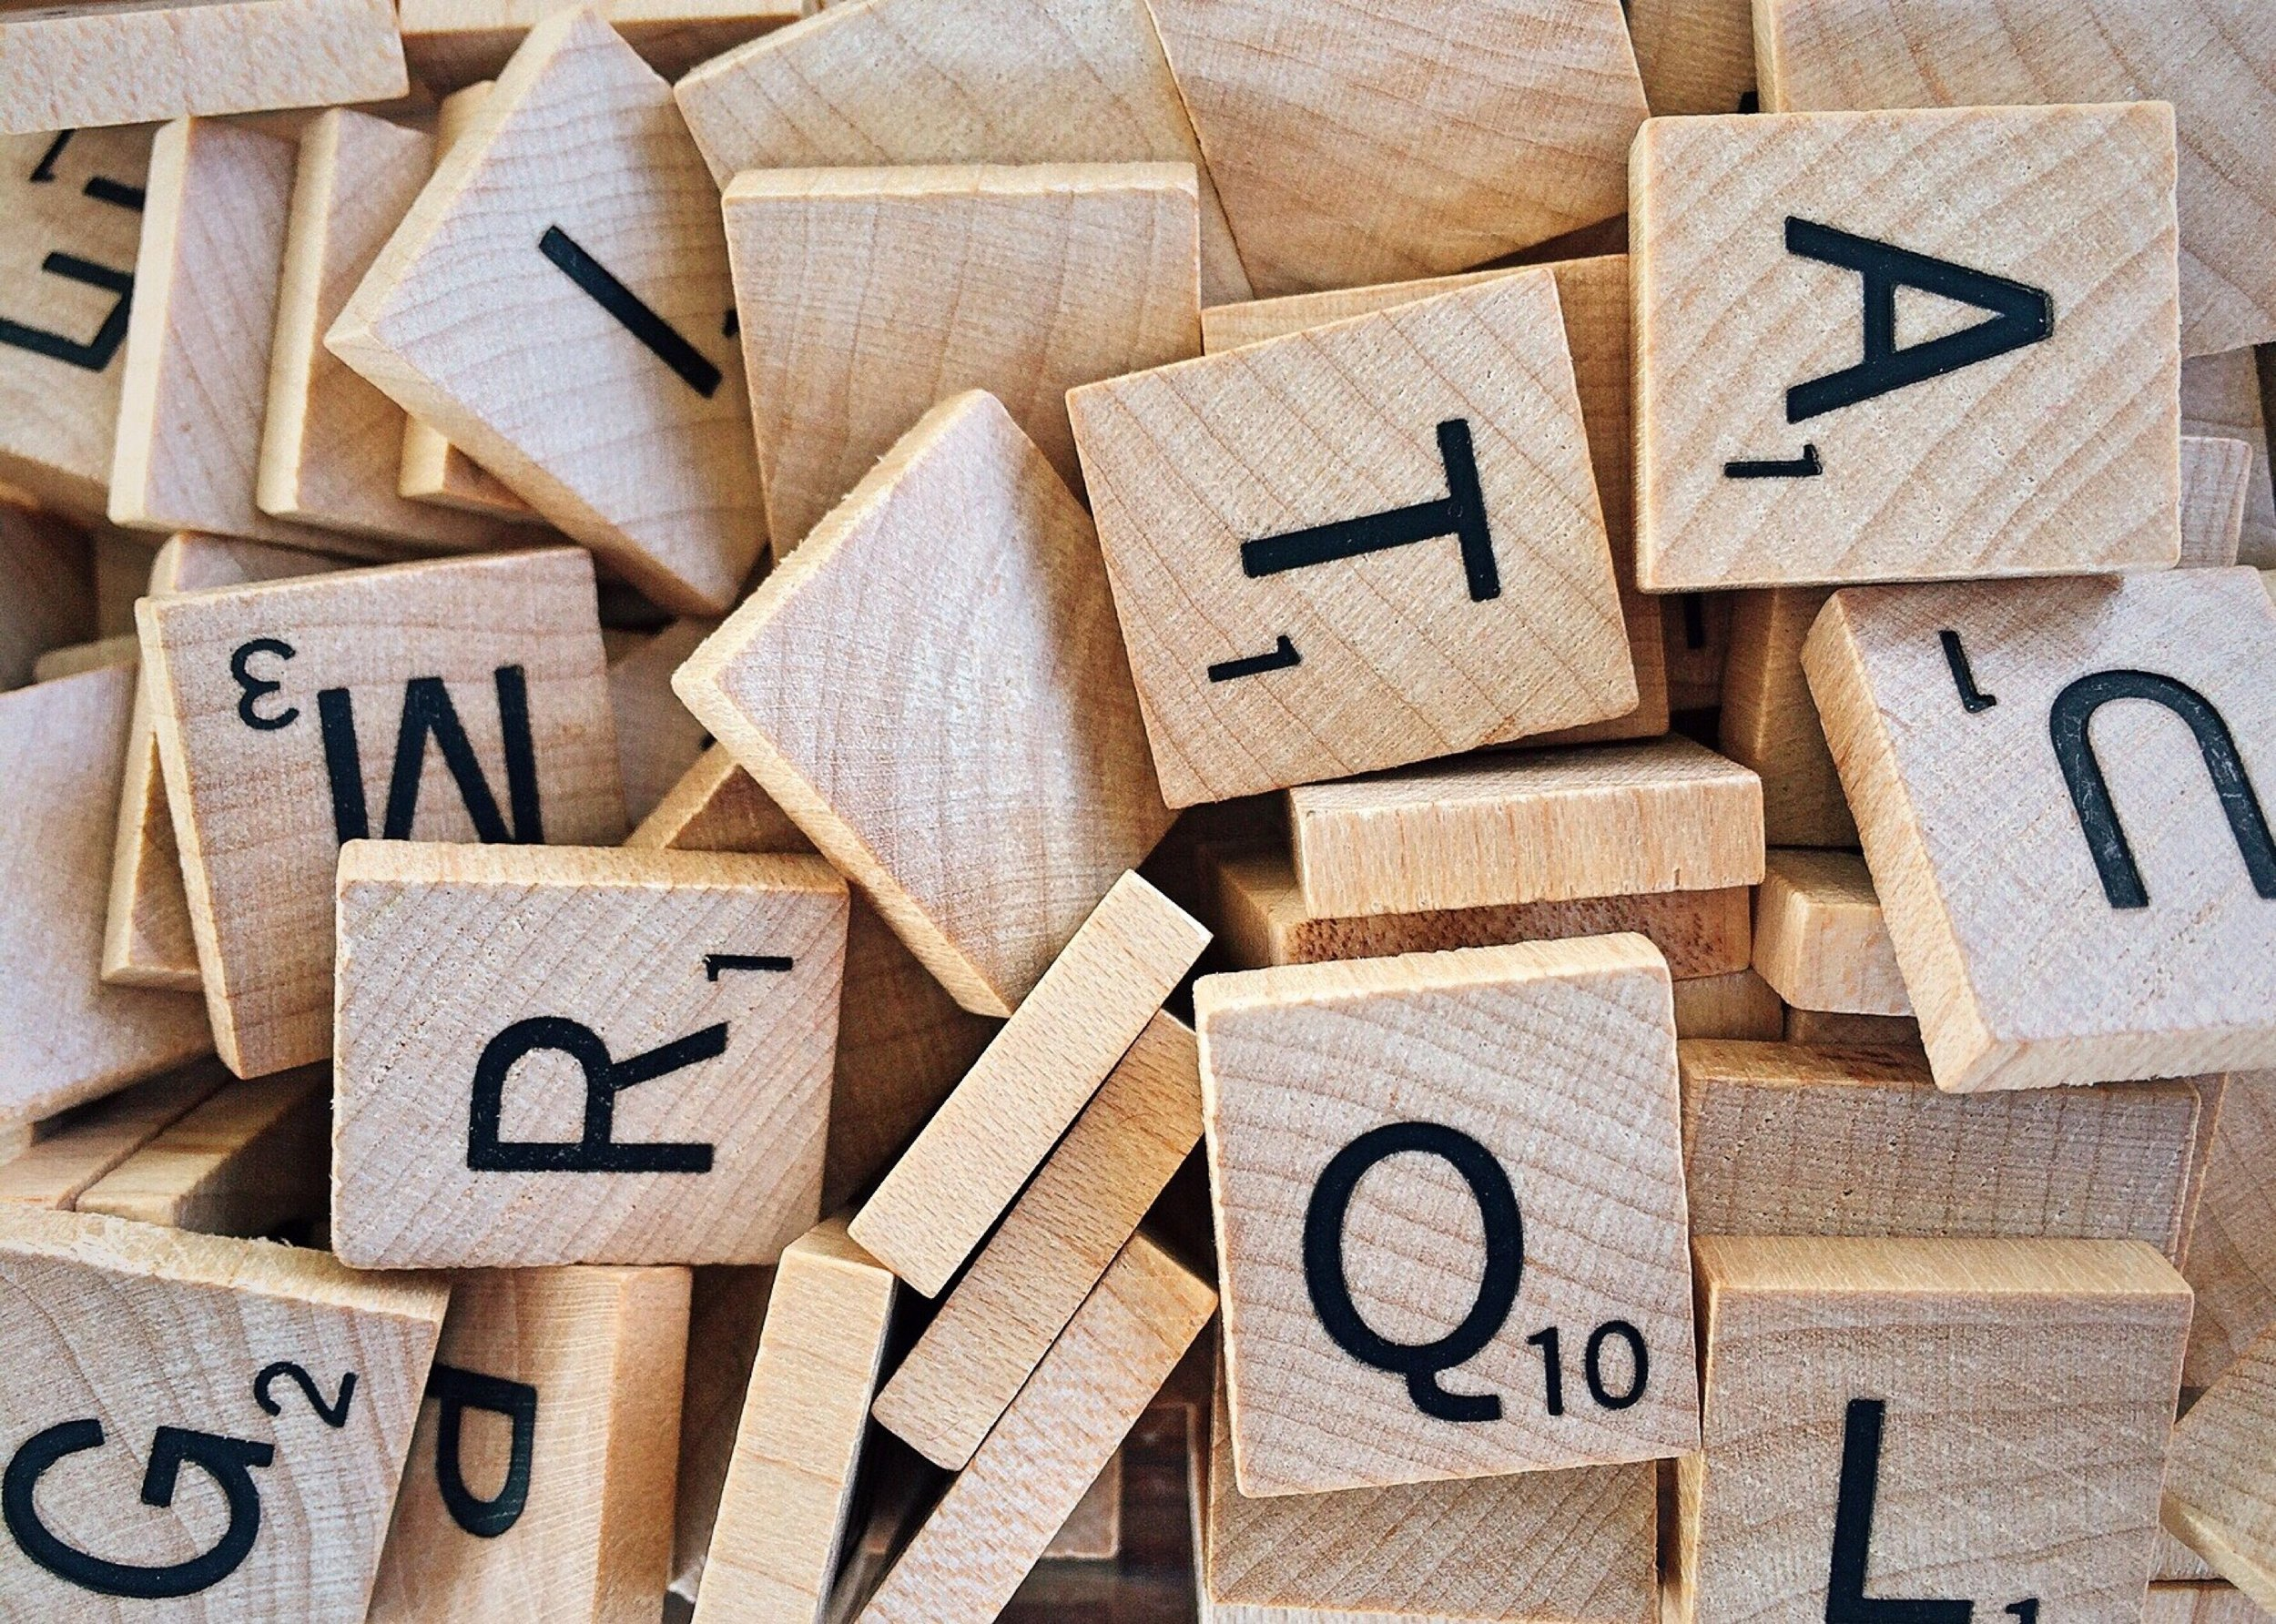 alphabet-board-game-box-278890.jpg